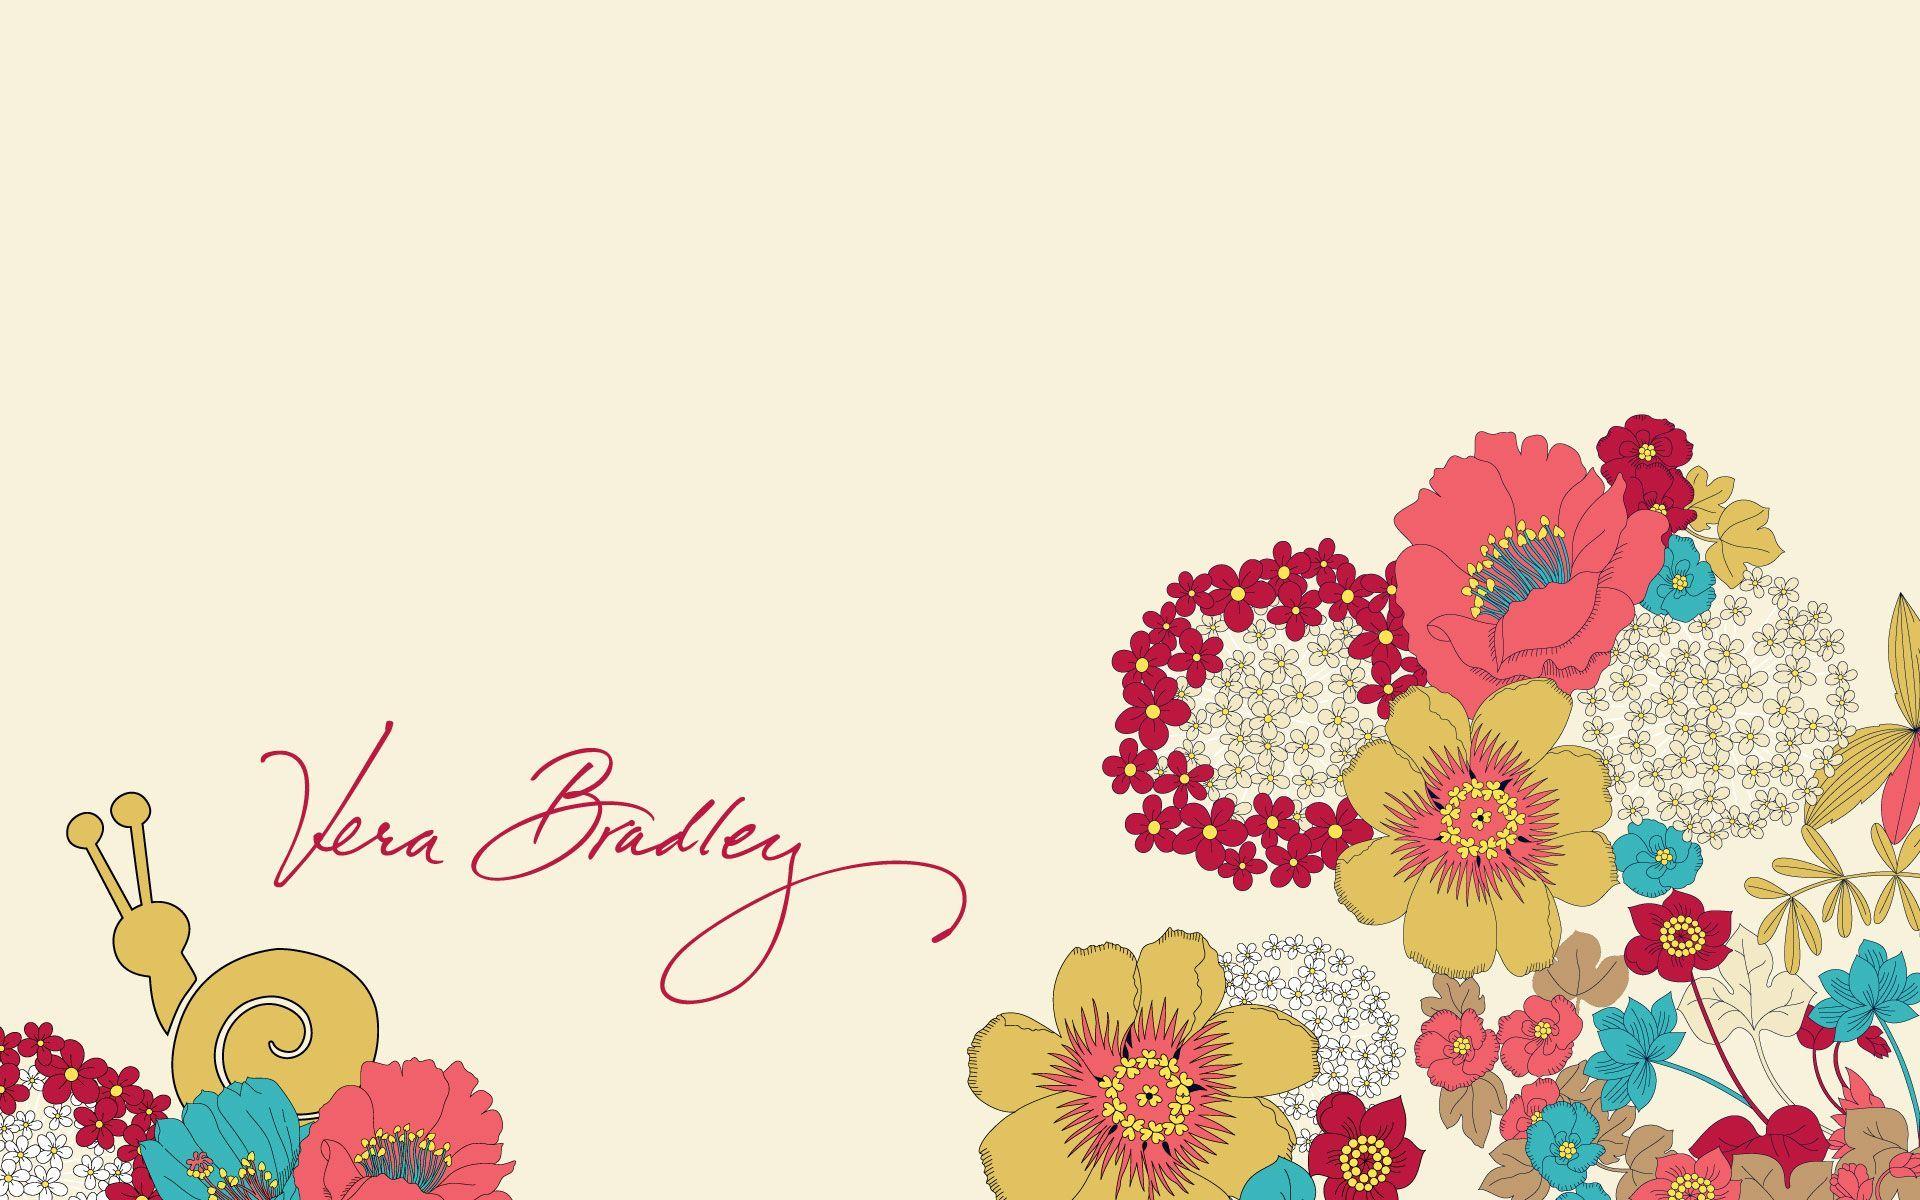 Vera Bradley Happy Snails Desktop Wallpaper Vera bradley